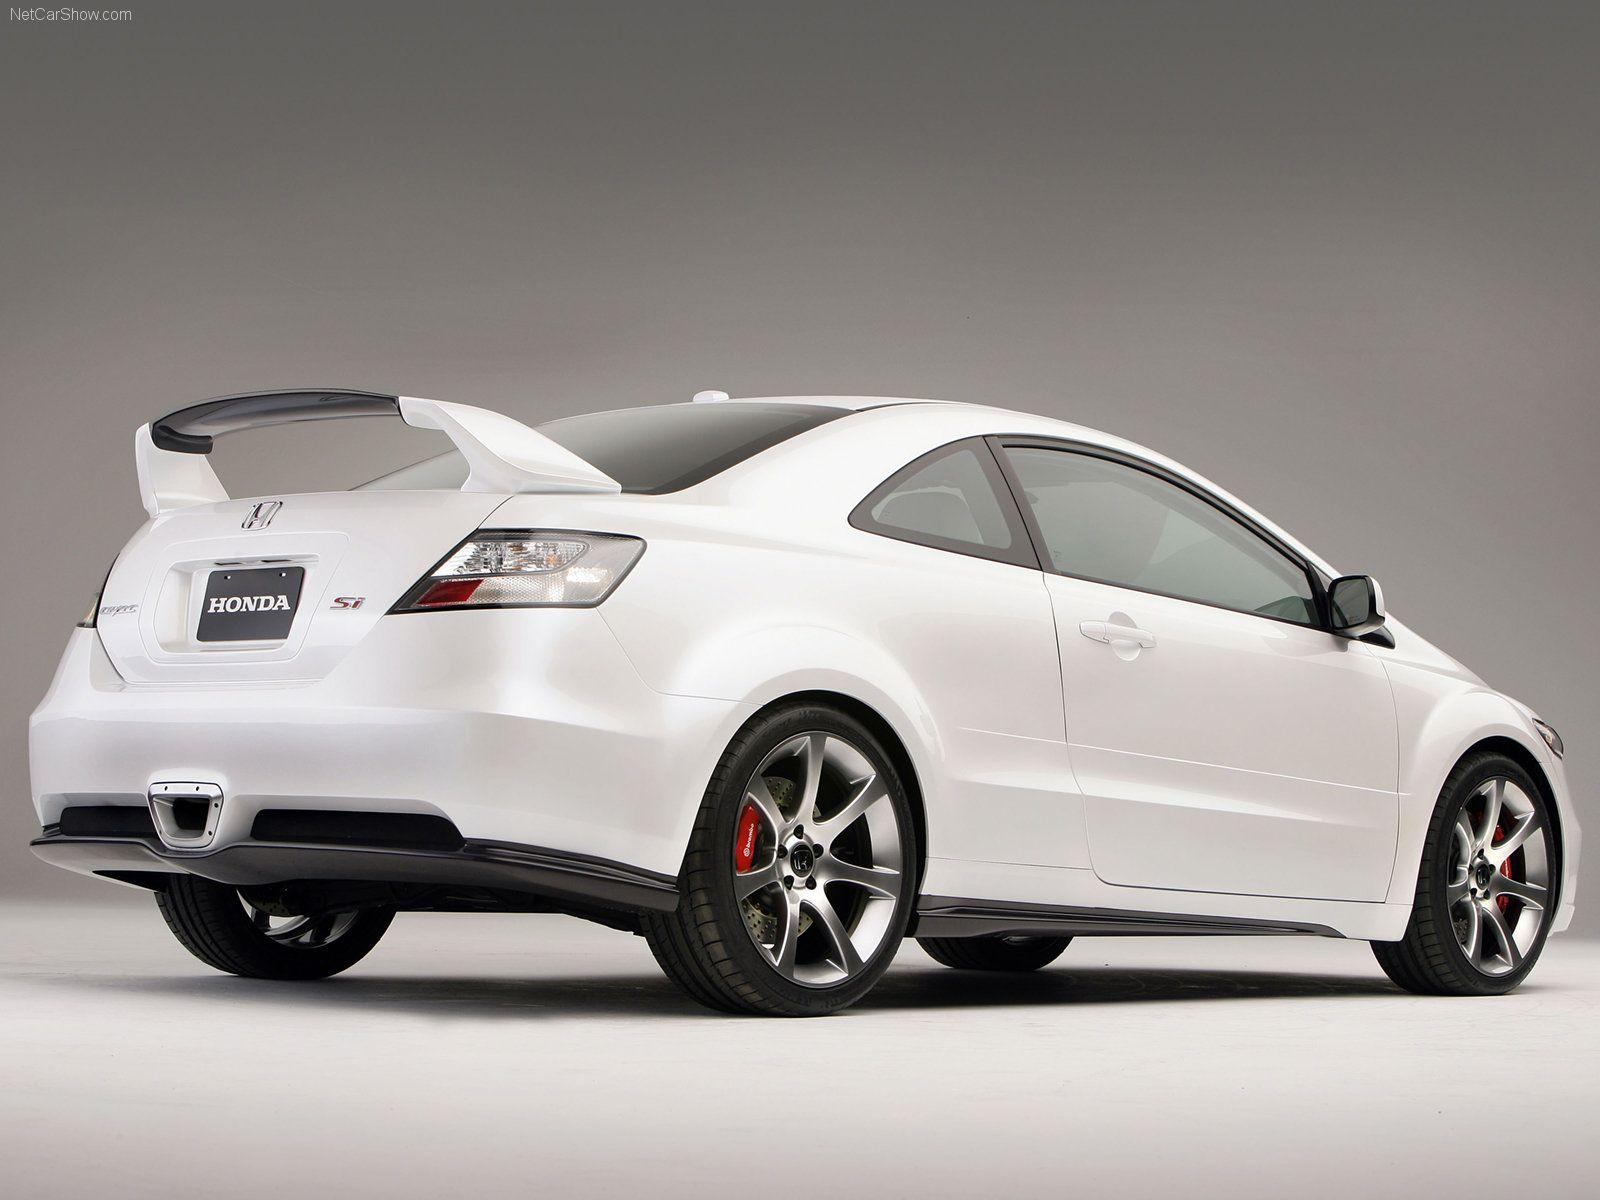 Charmant Civic Si   Honda Civic Si Sport Car Concept   Full HD Desktop Wallpapers